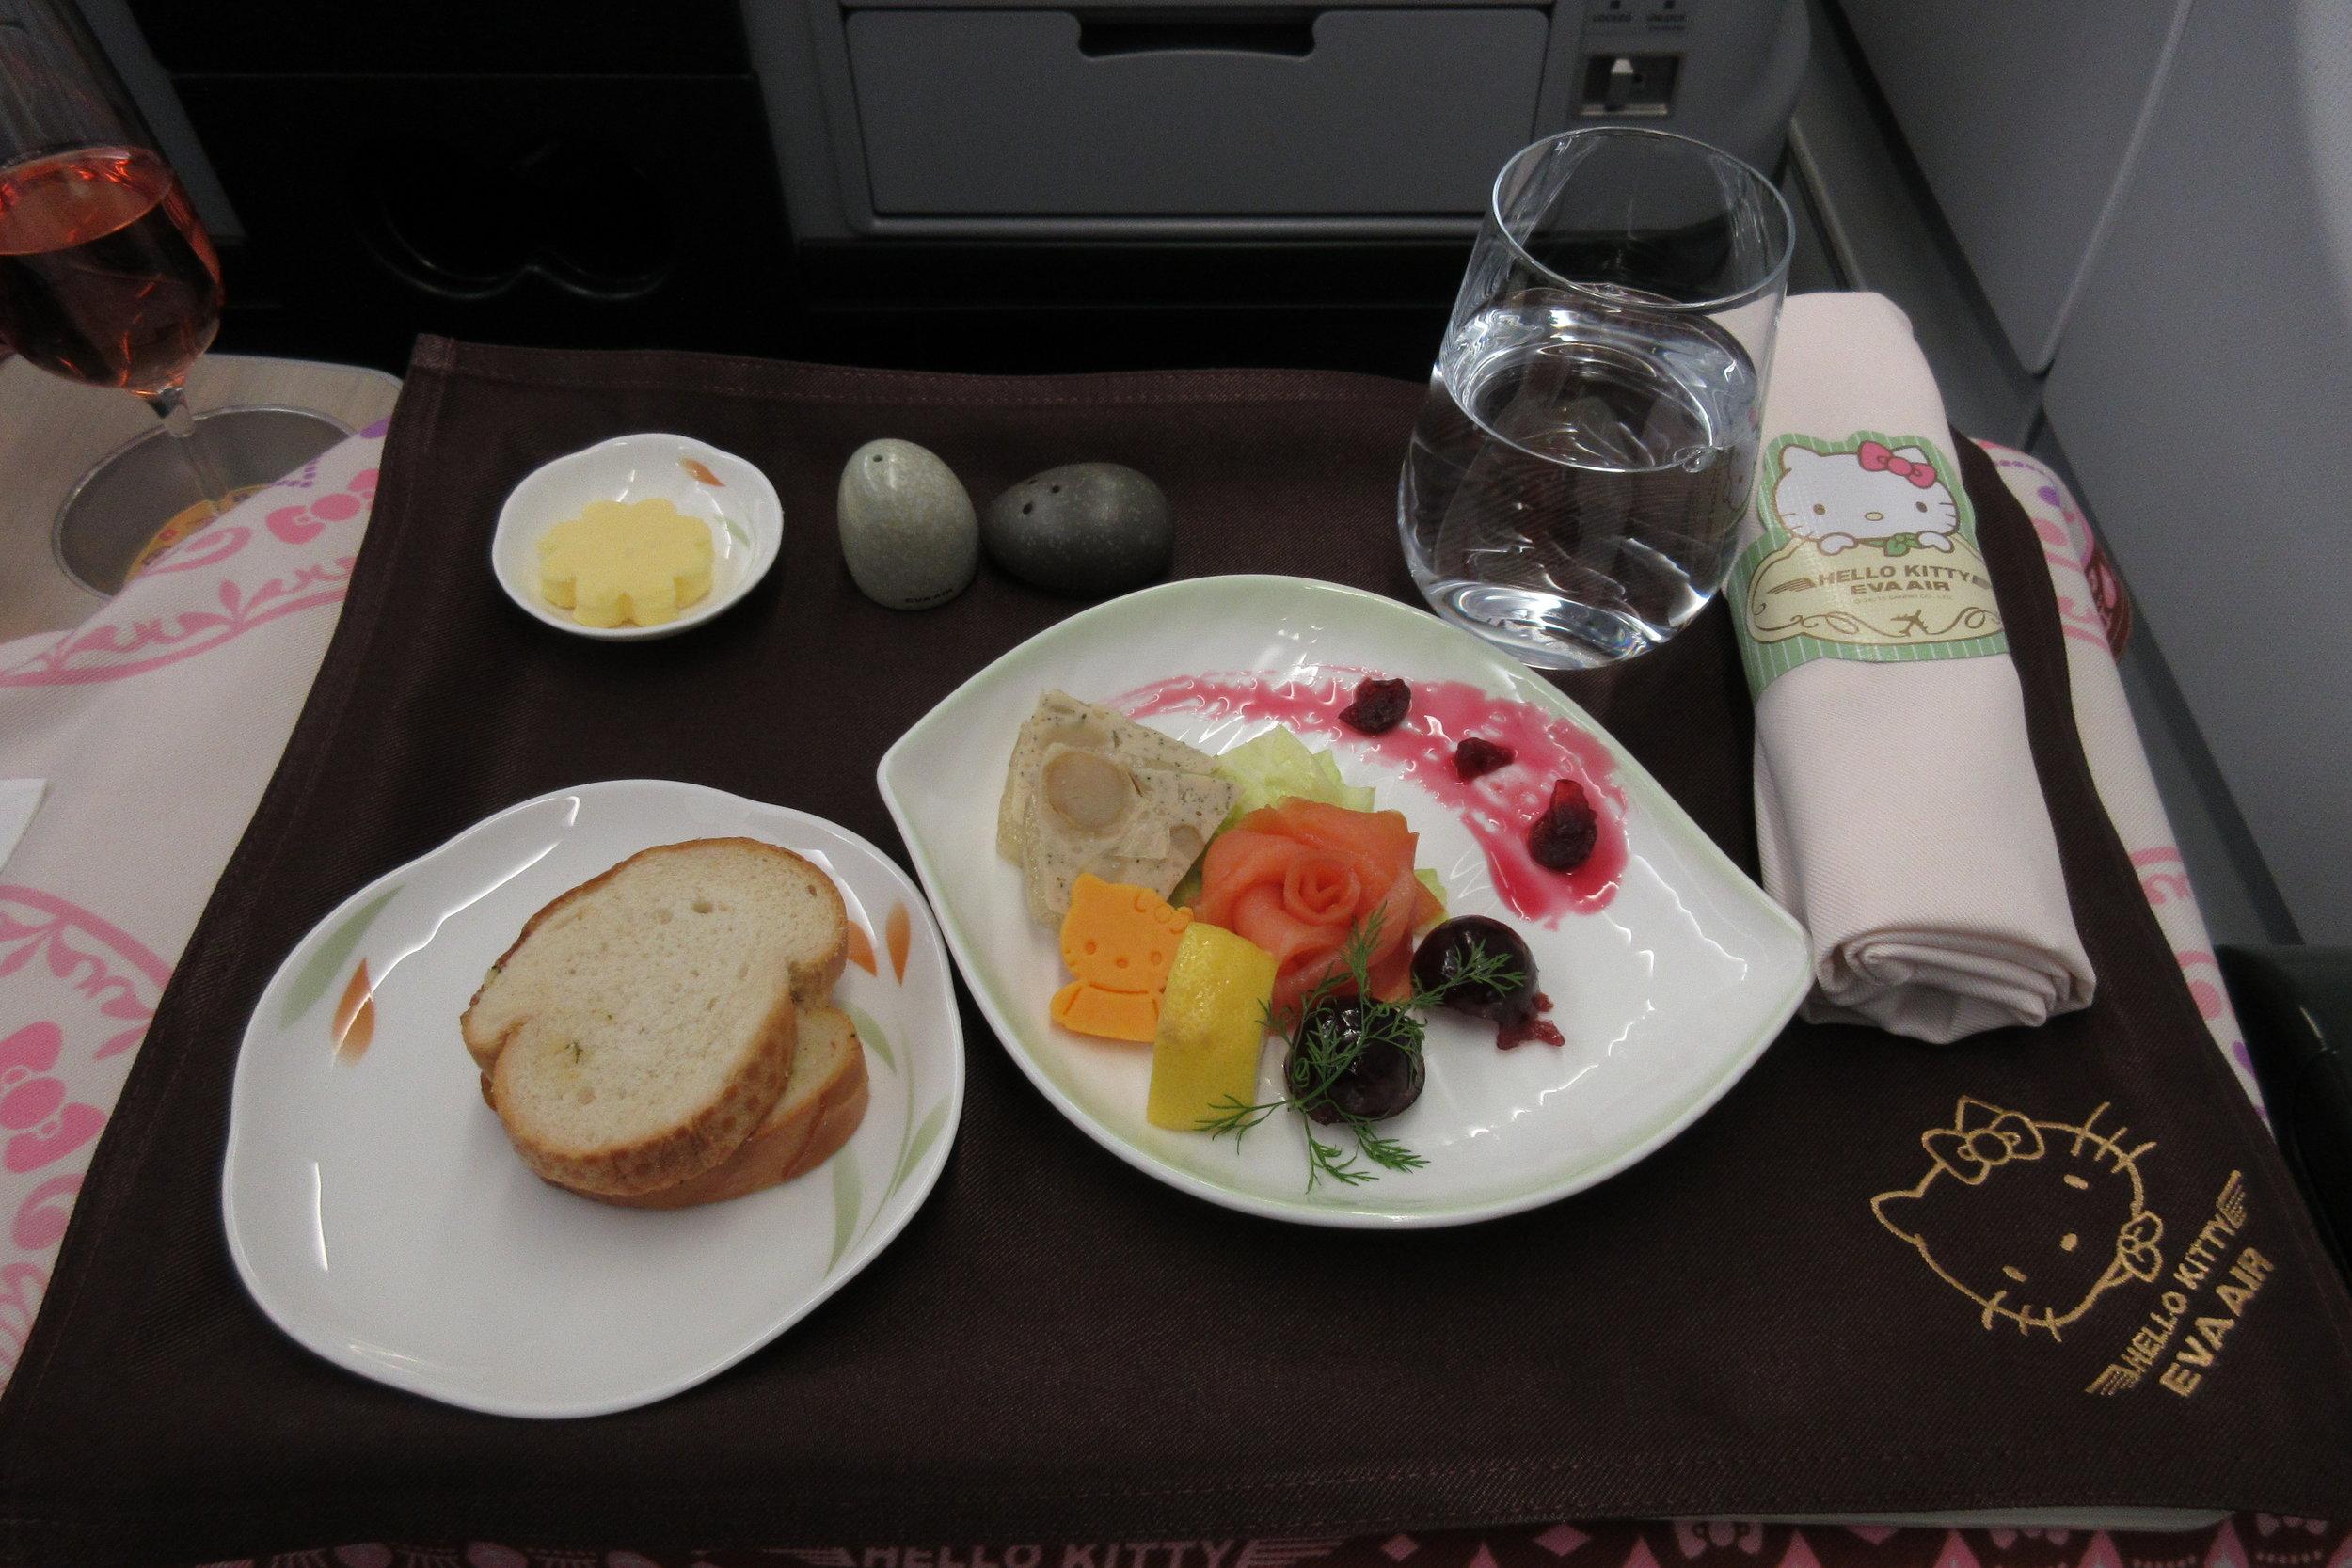 Hello Kitty-themed meal service aboard EVA Air